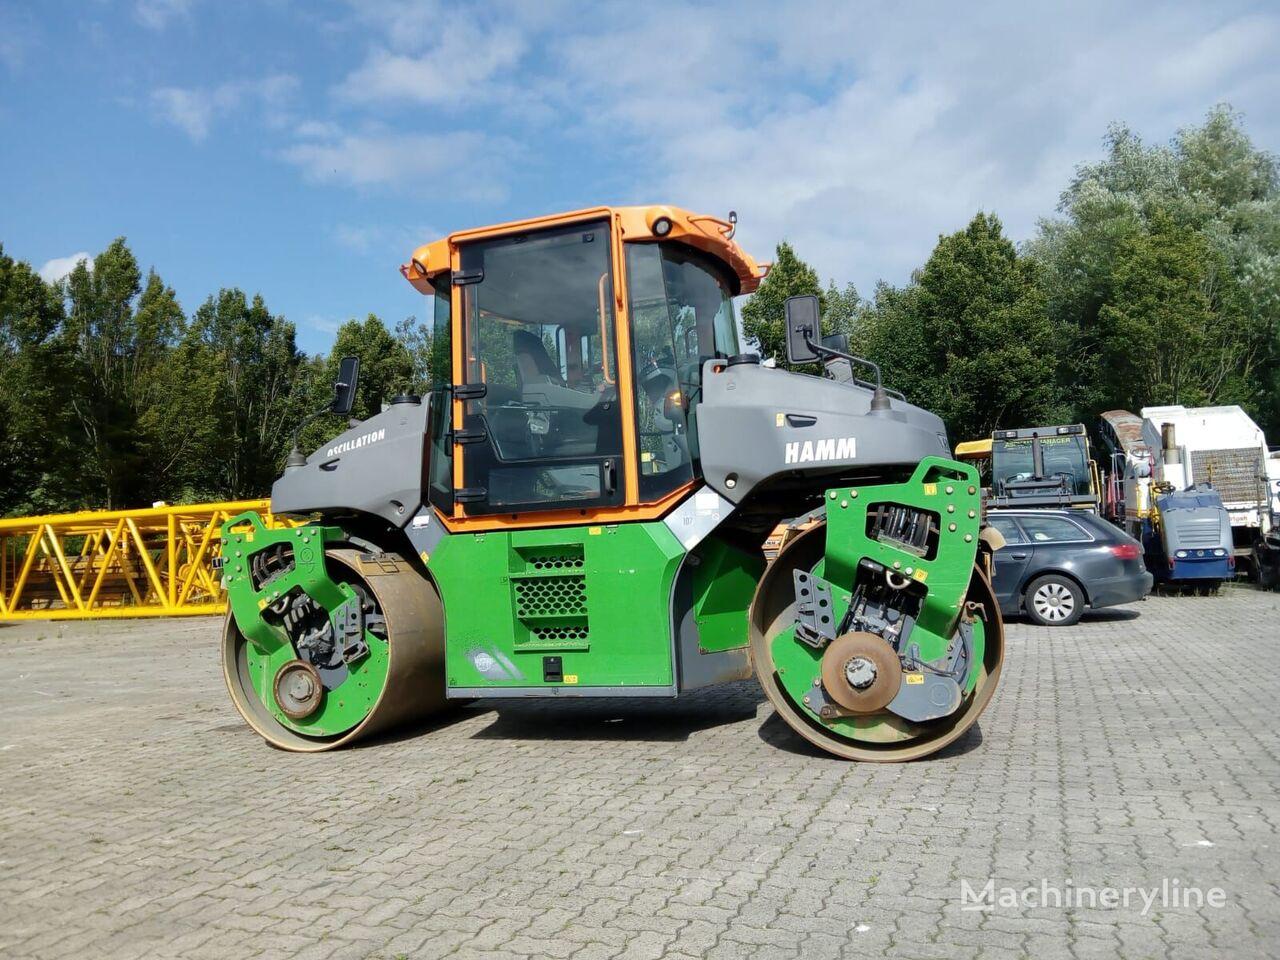 HAMM DV+90i VO-S road roller